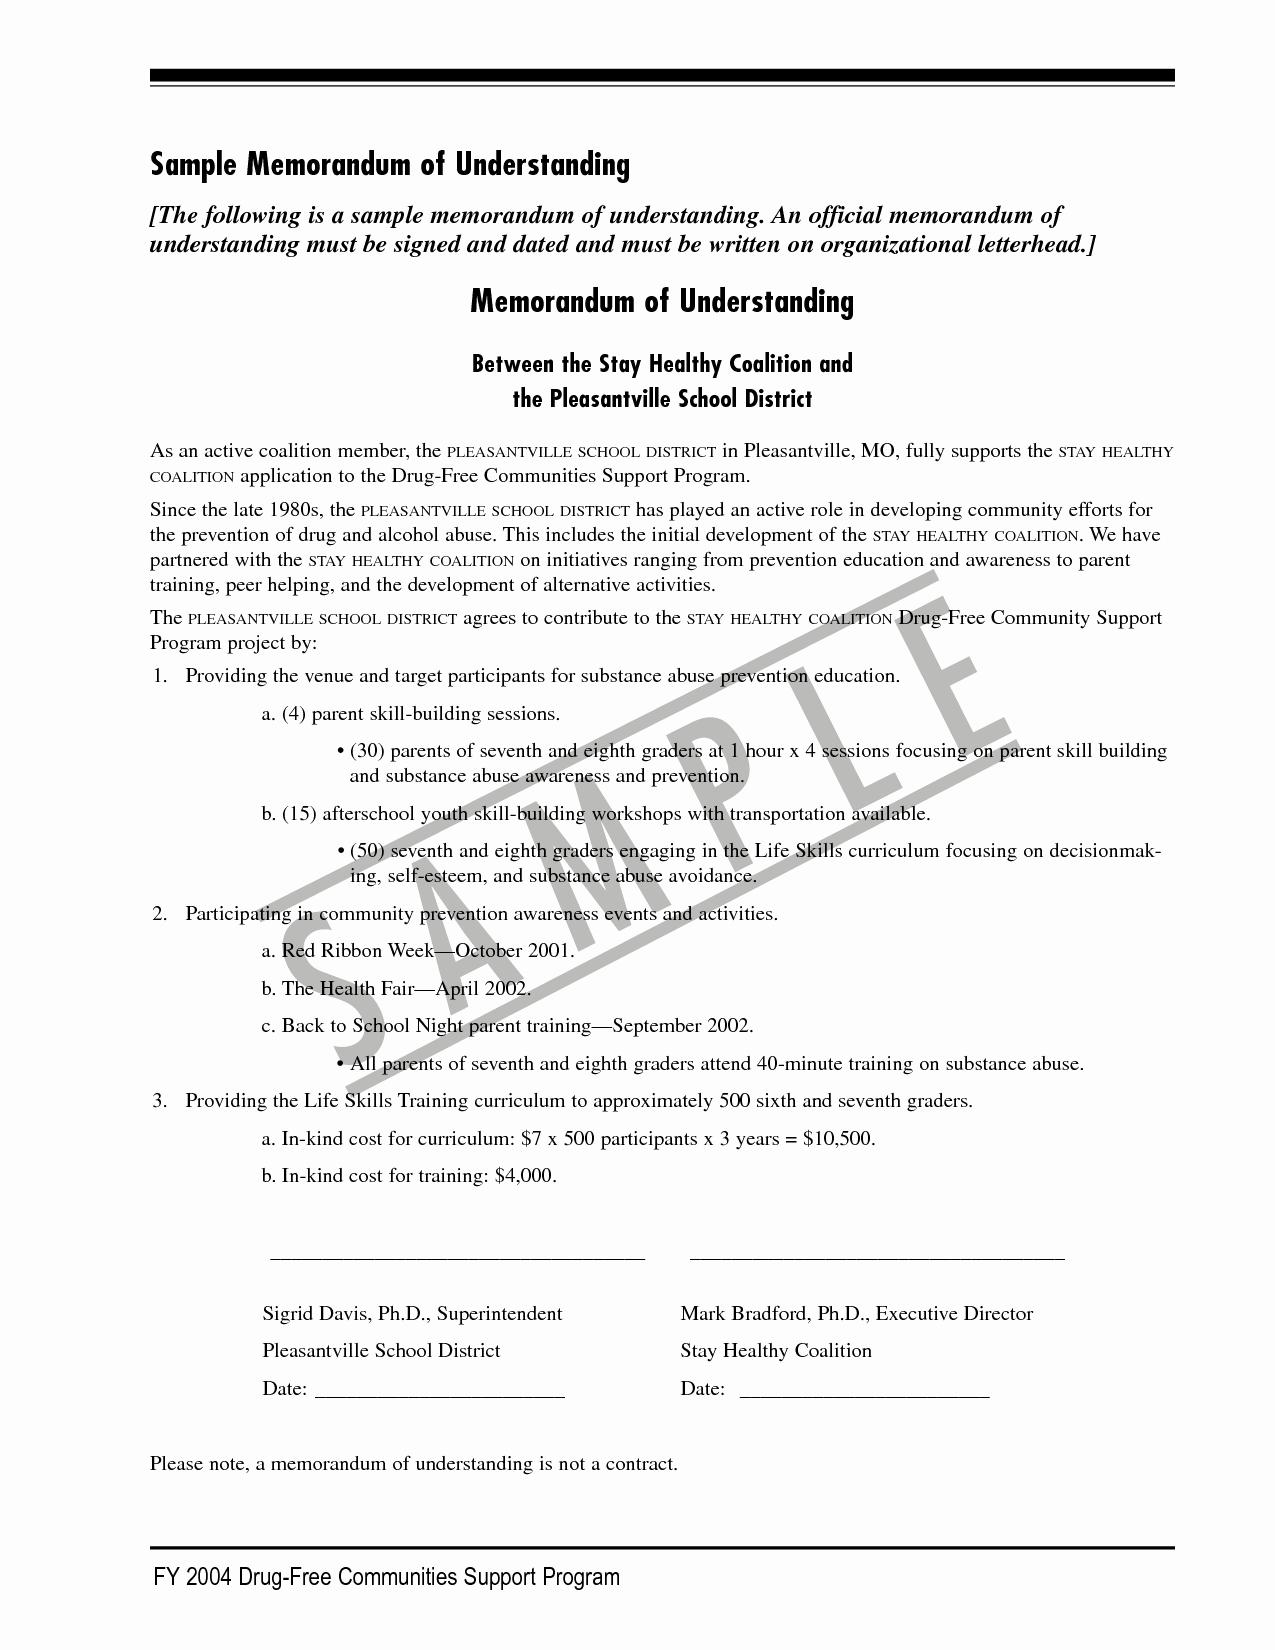 Memorandum Of Agreement Template Elegant 10 Best Of Example Memorandum Understanding